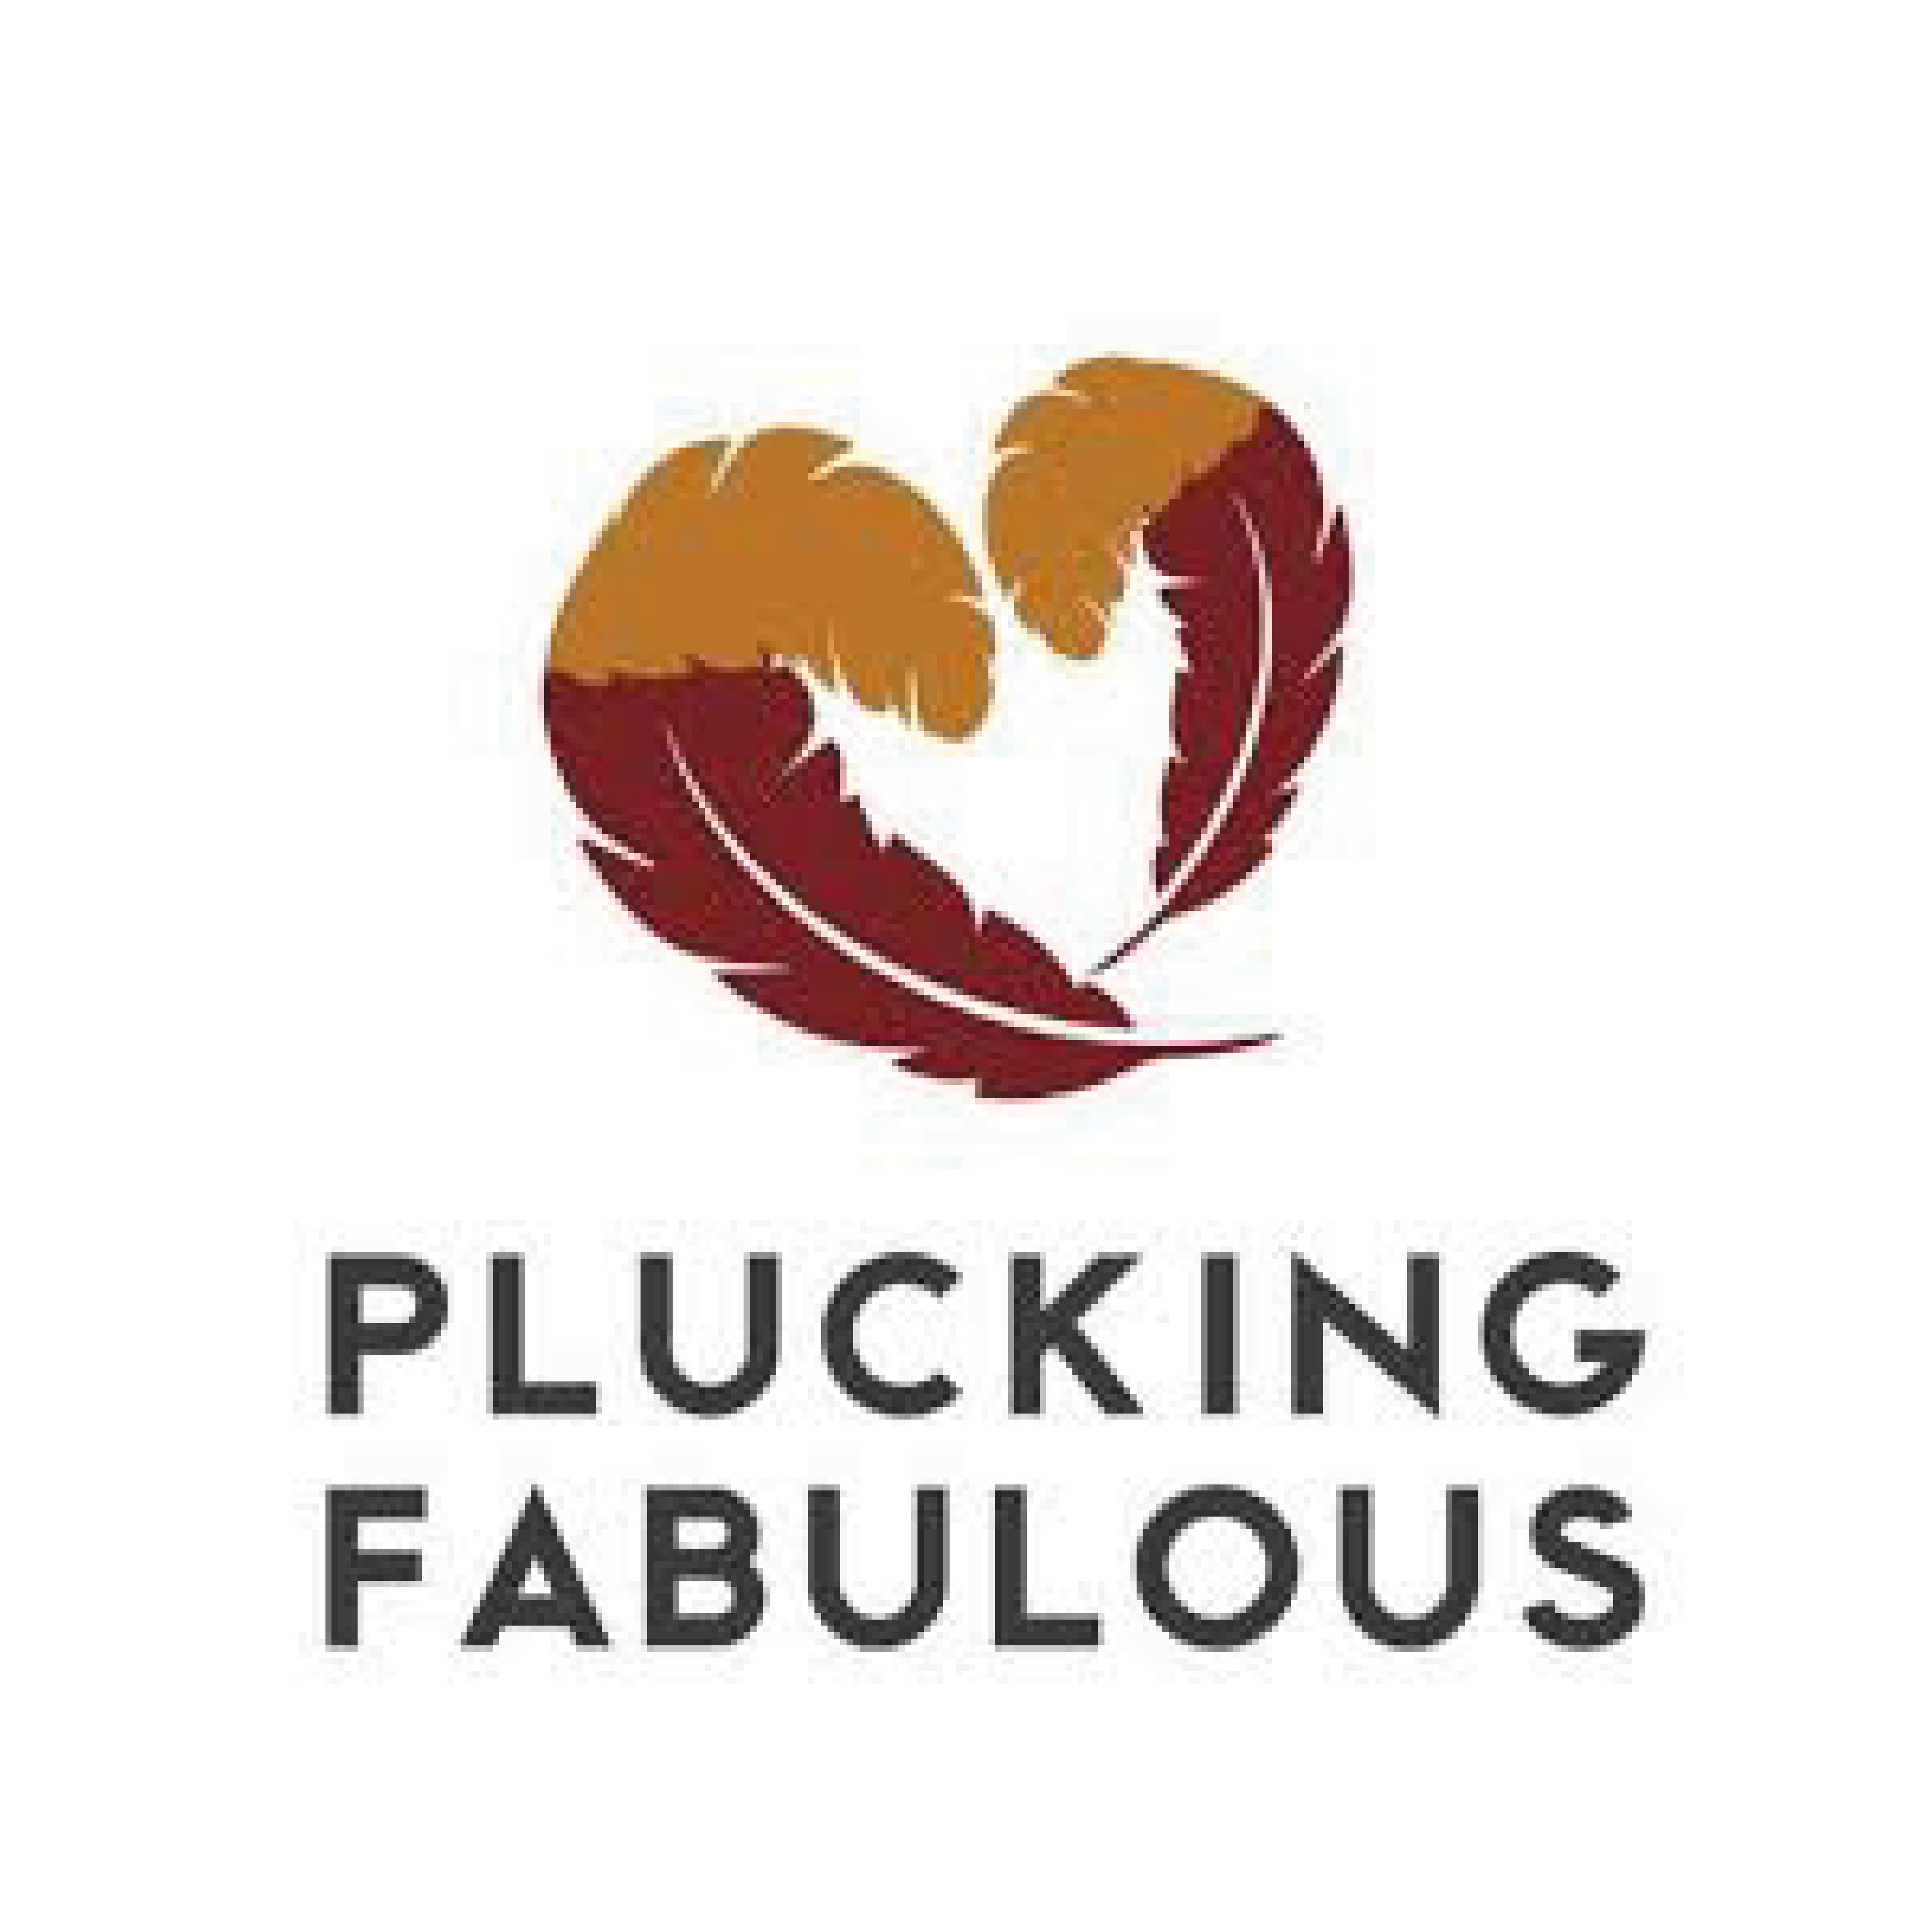 Plucking Fabulous